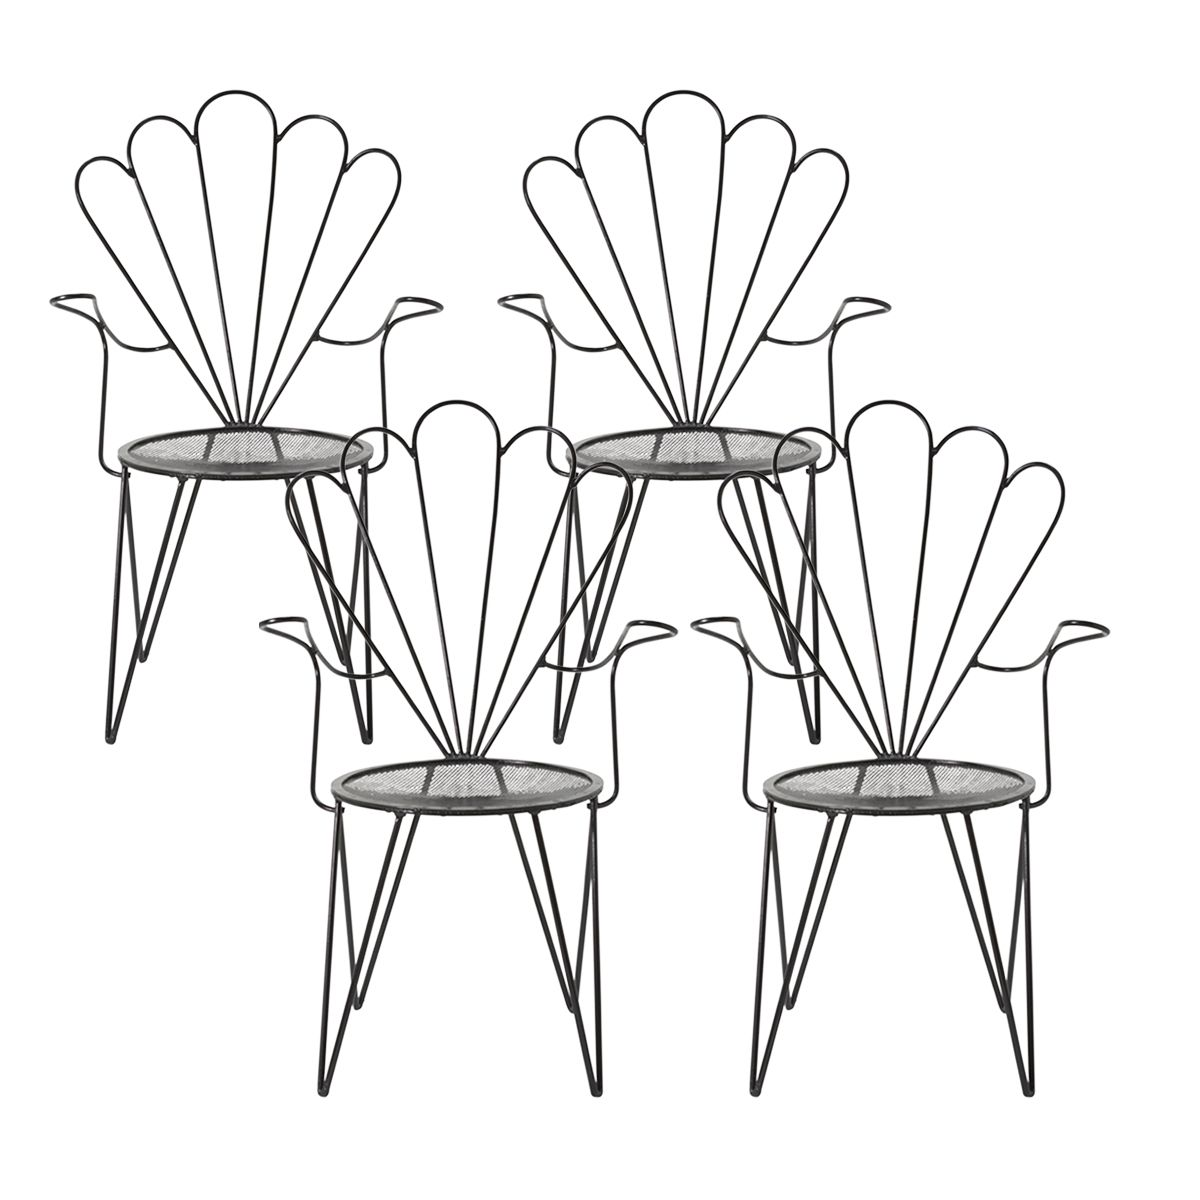 Fan Back Garden Chairs in 8  Garden chairs, Furniture resale